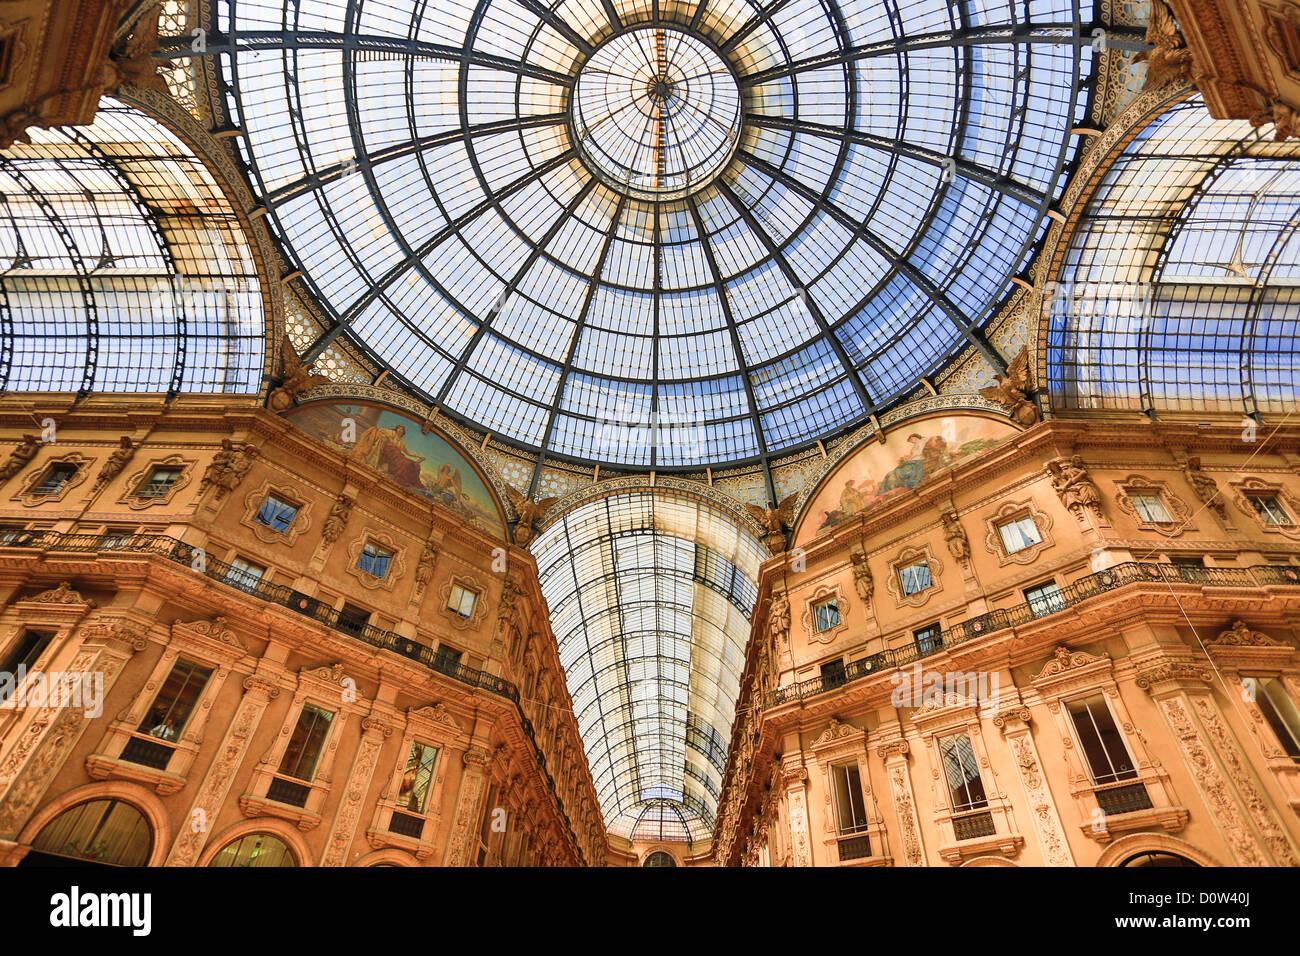 Italy Europe travel Milano Milan City Vittorio Emanuele Galleria architecture center columns downtown gallery gate - Stock Image